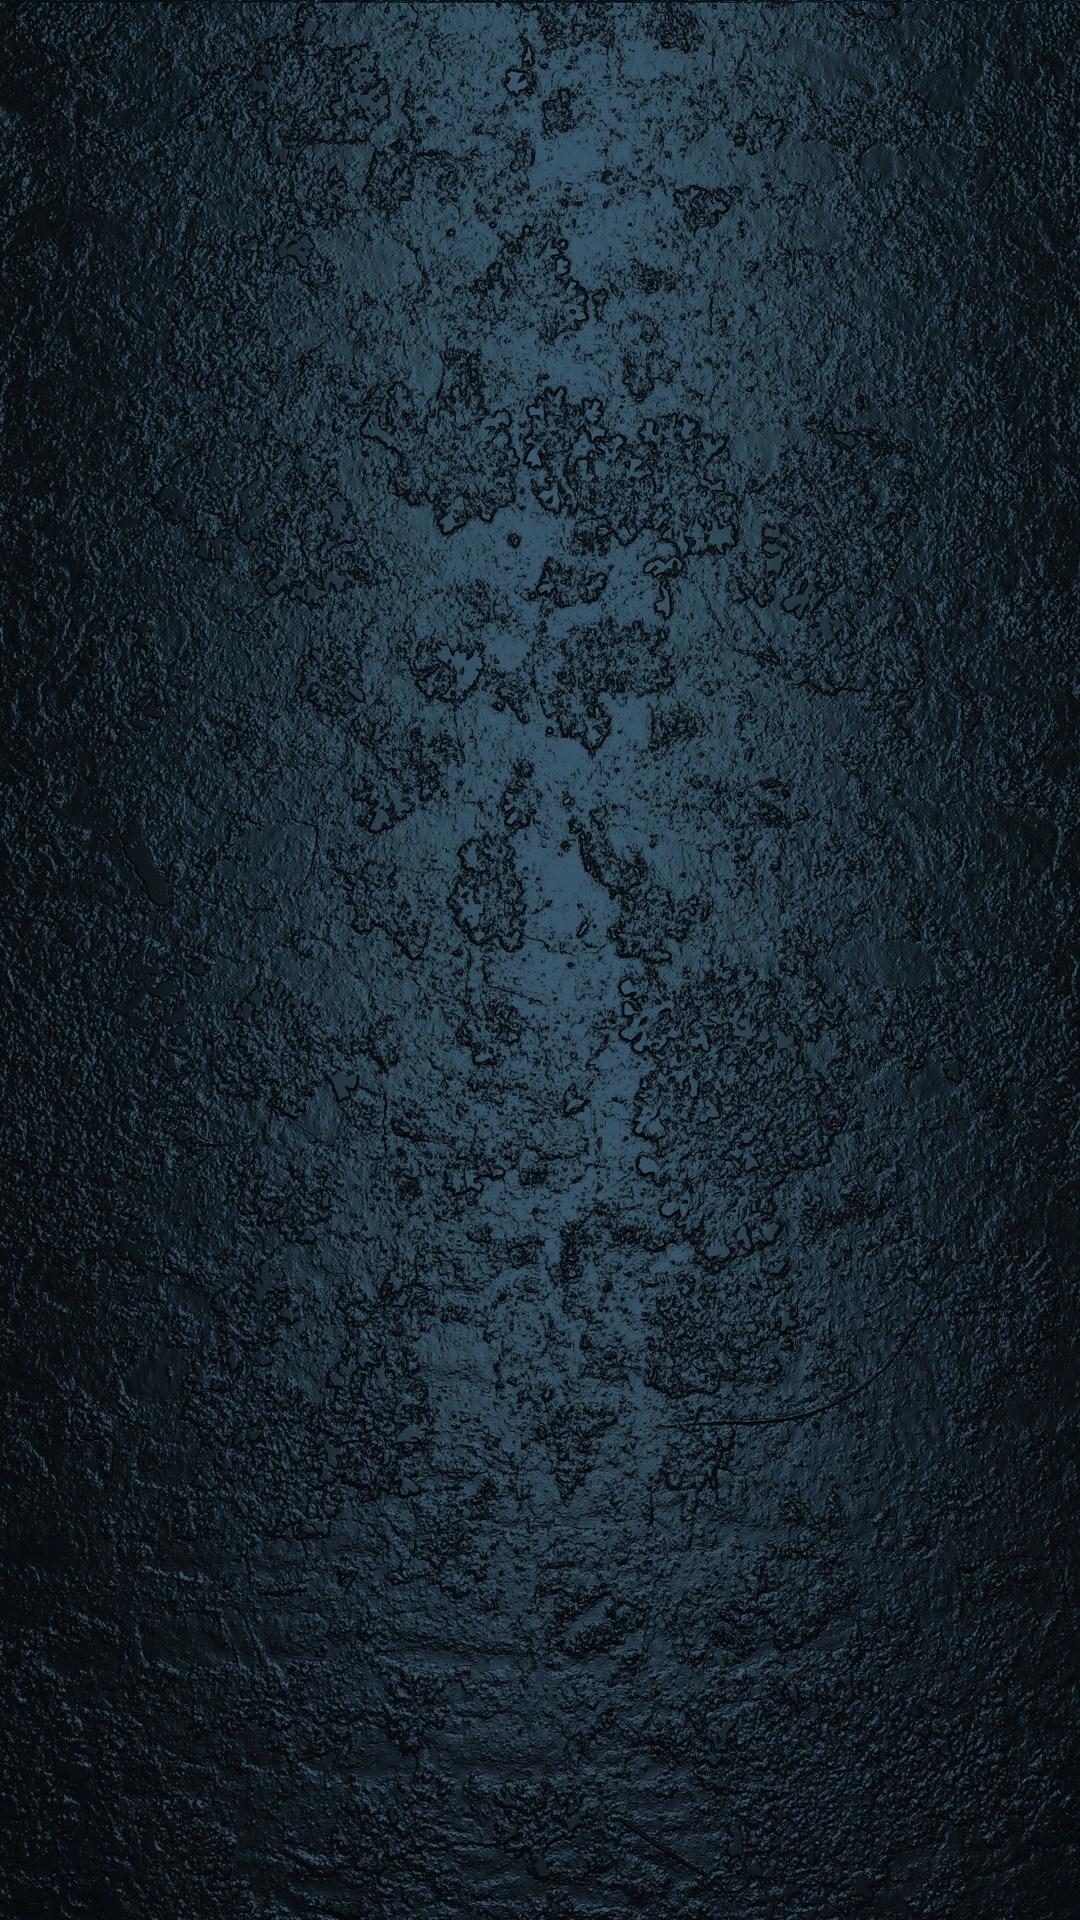 Blue Metallic High Defination iPhone Wallpapers 1080x1920